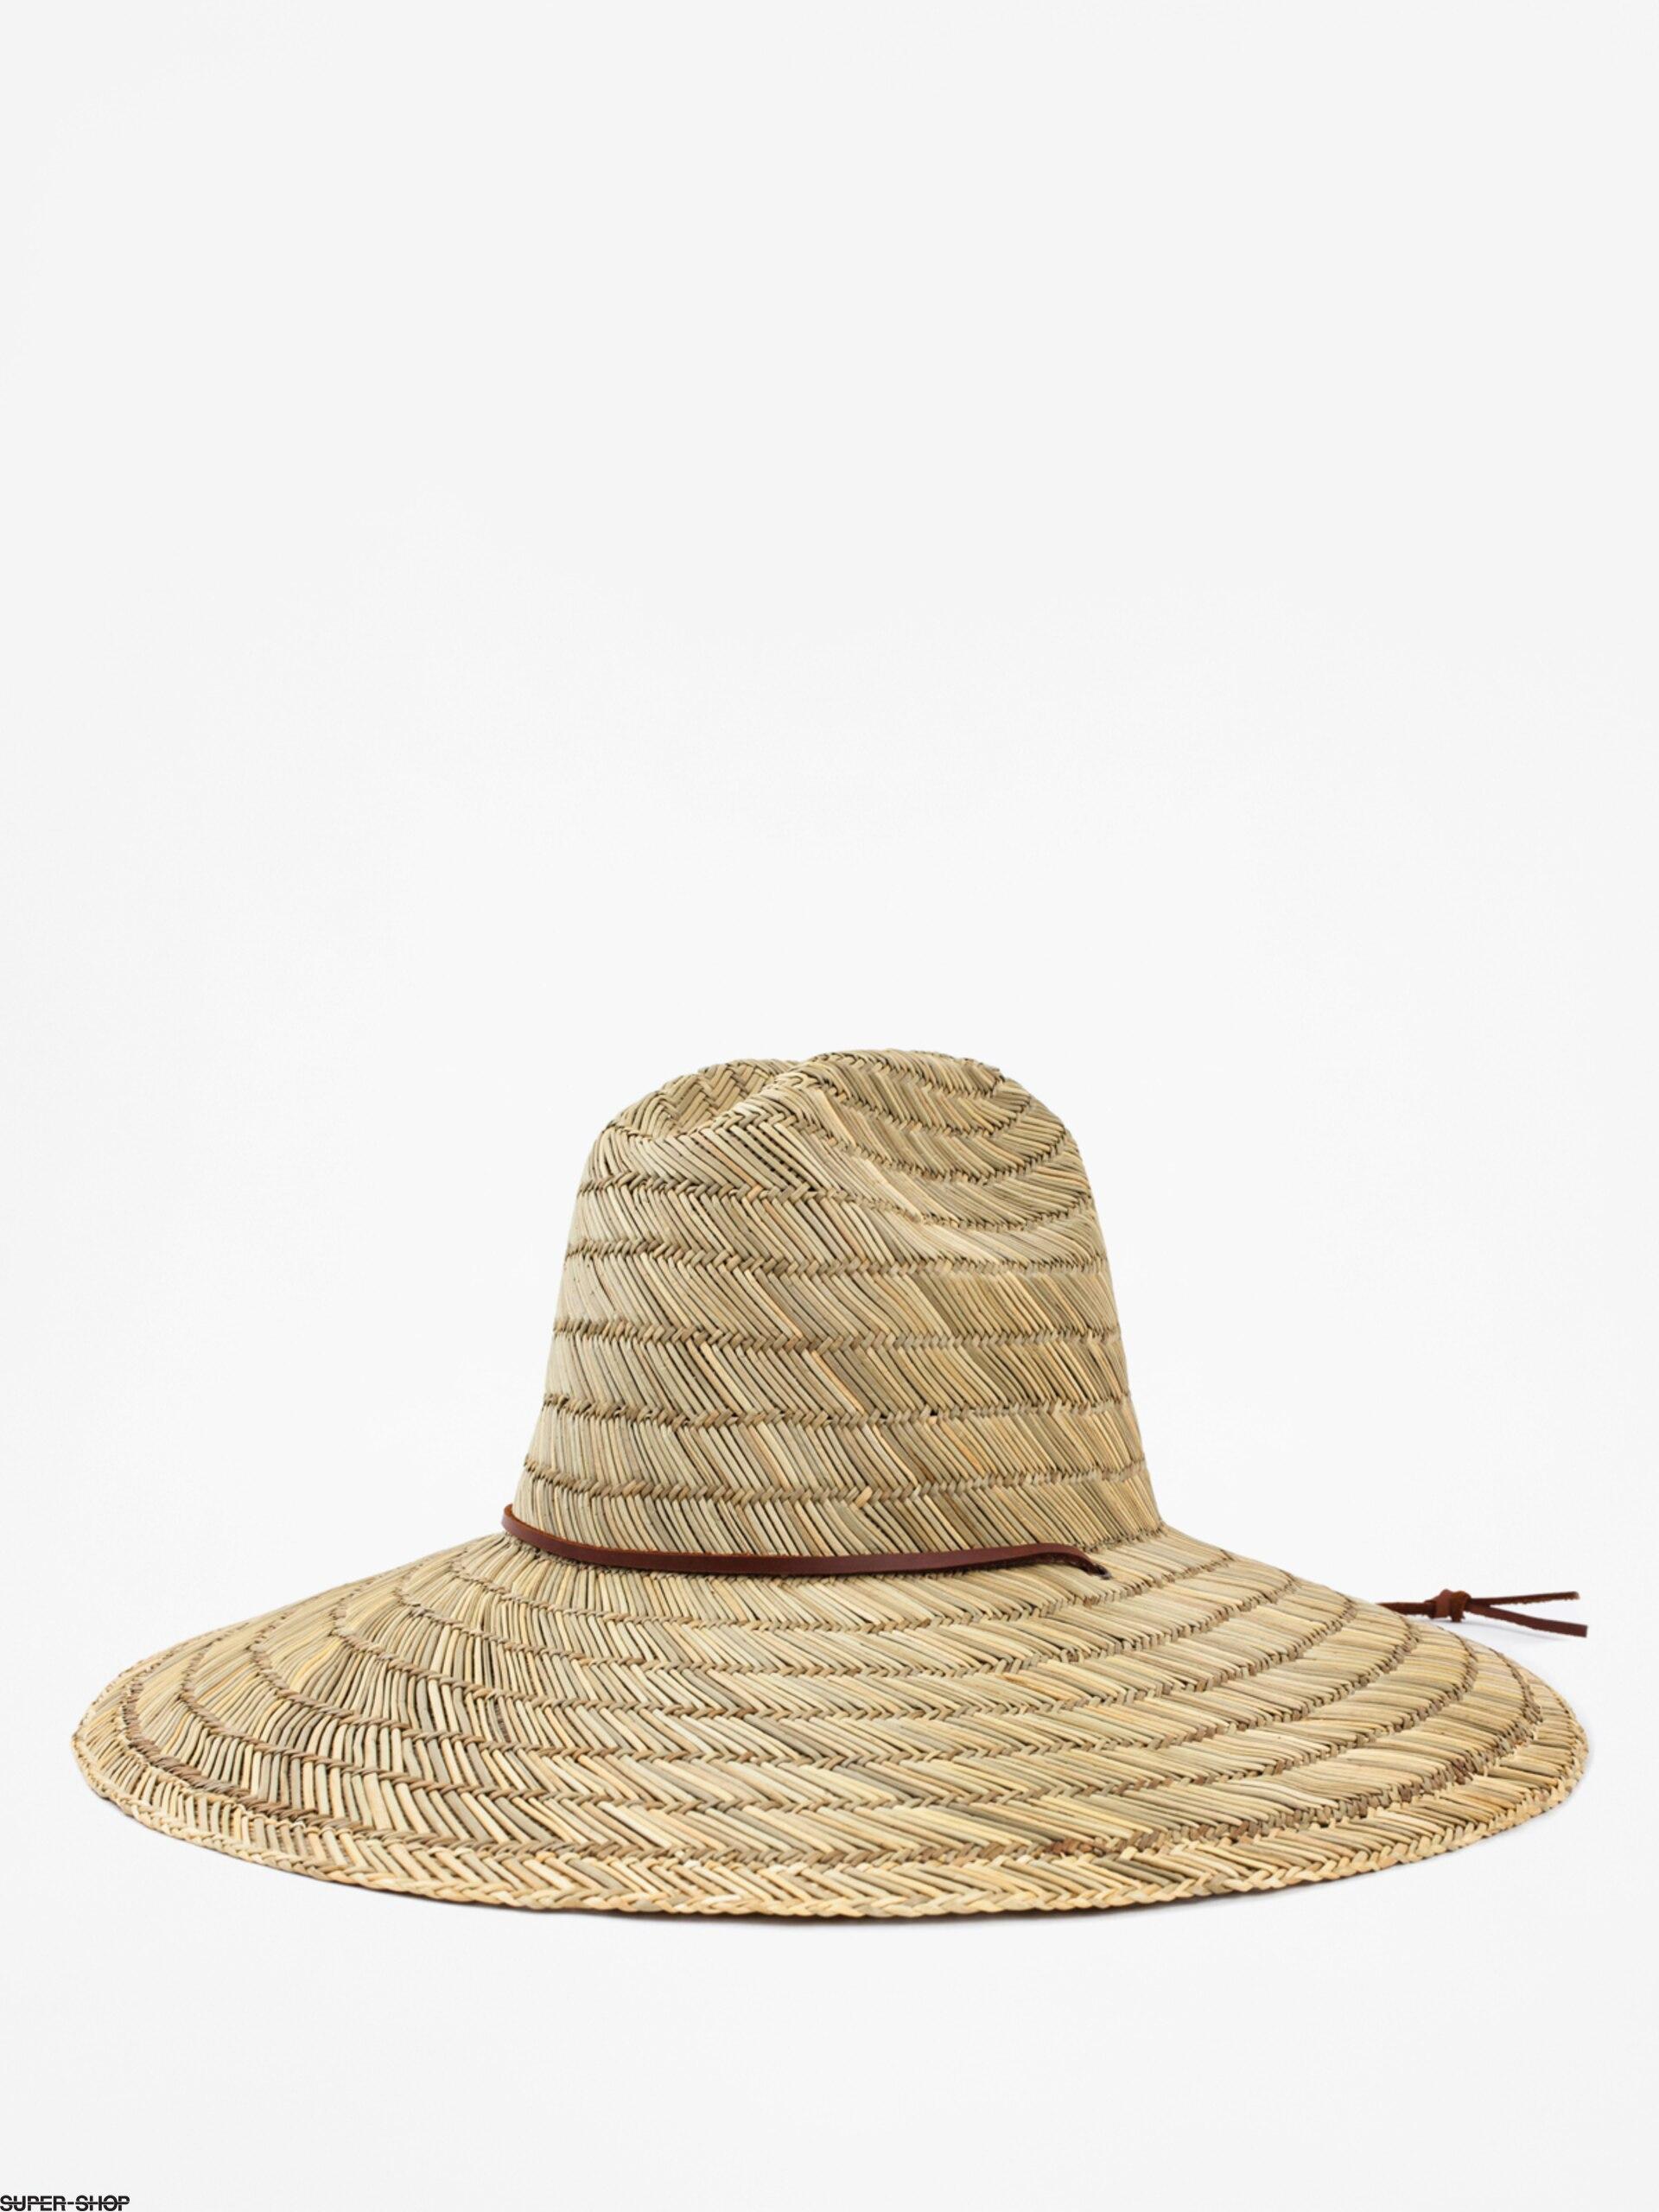 1020549-w1920-brixton-bells-fedora-hat-tan.jpg 1a8a81086238